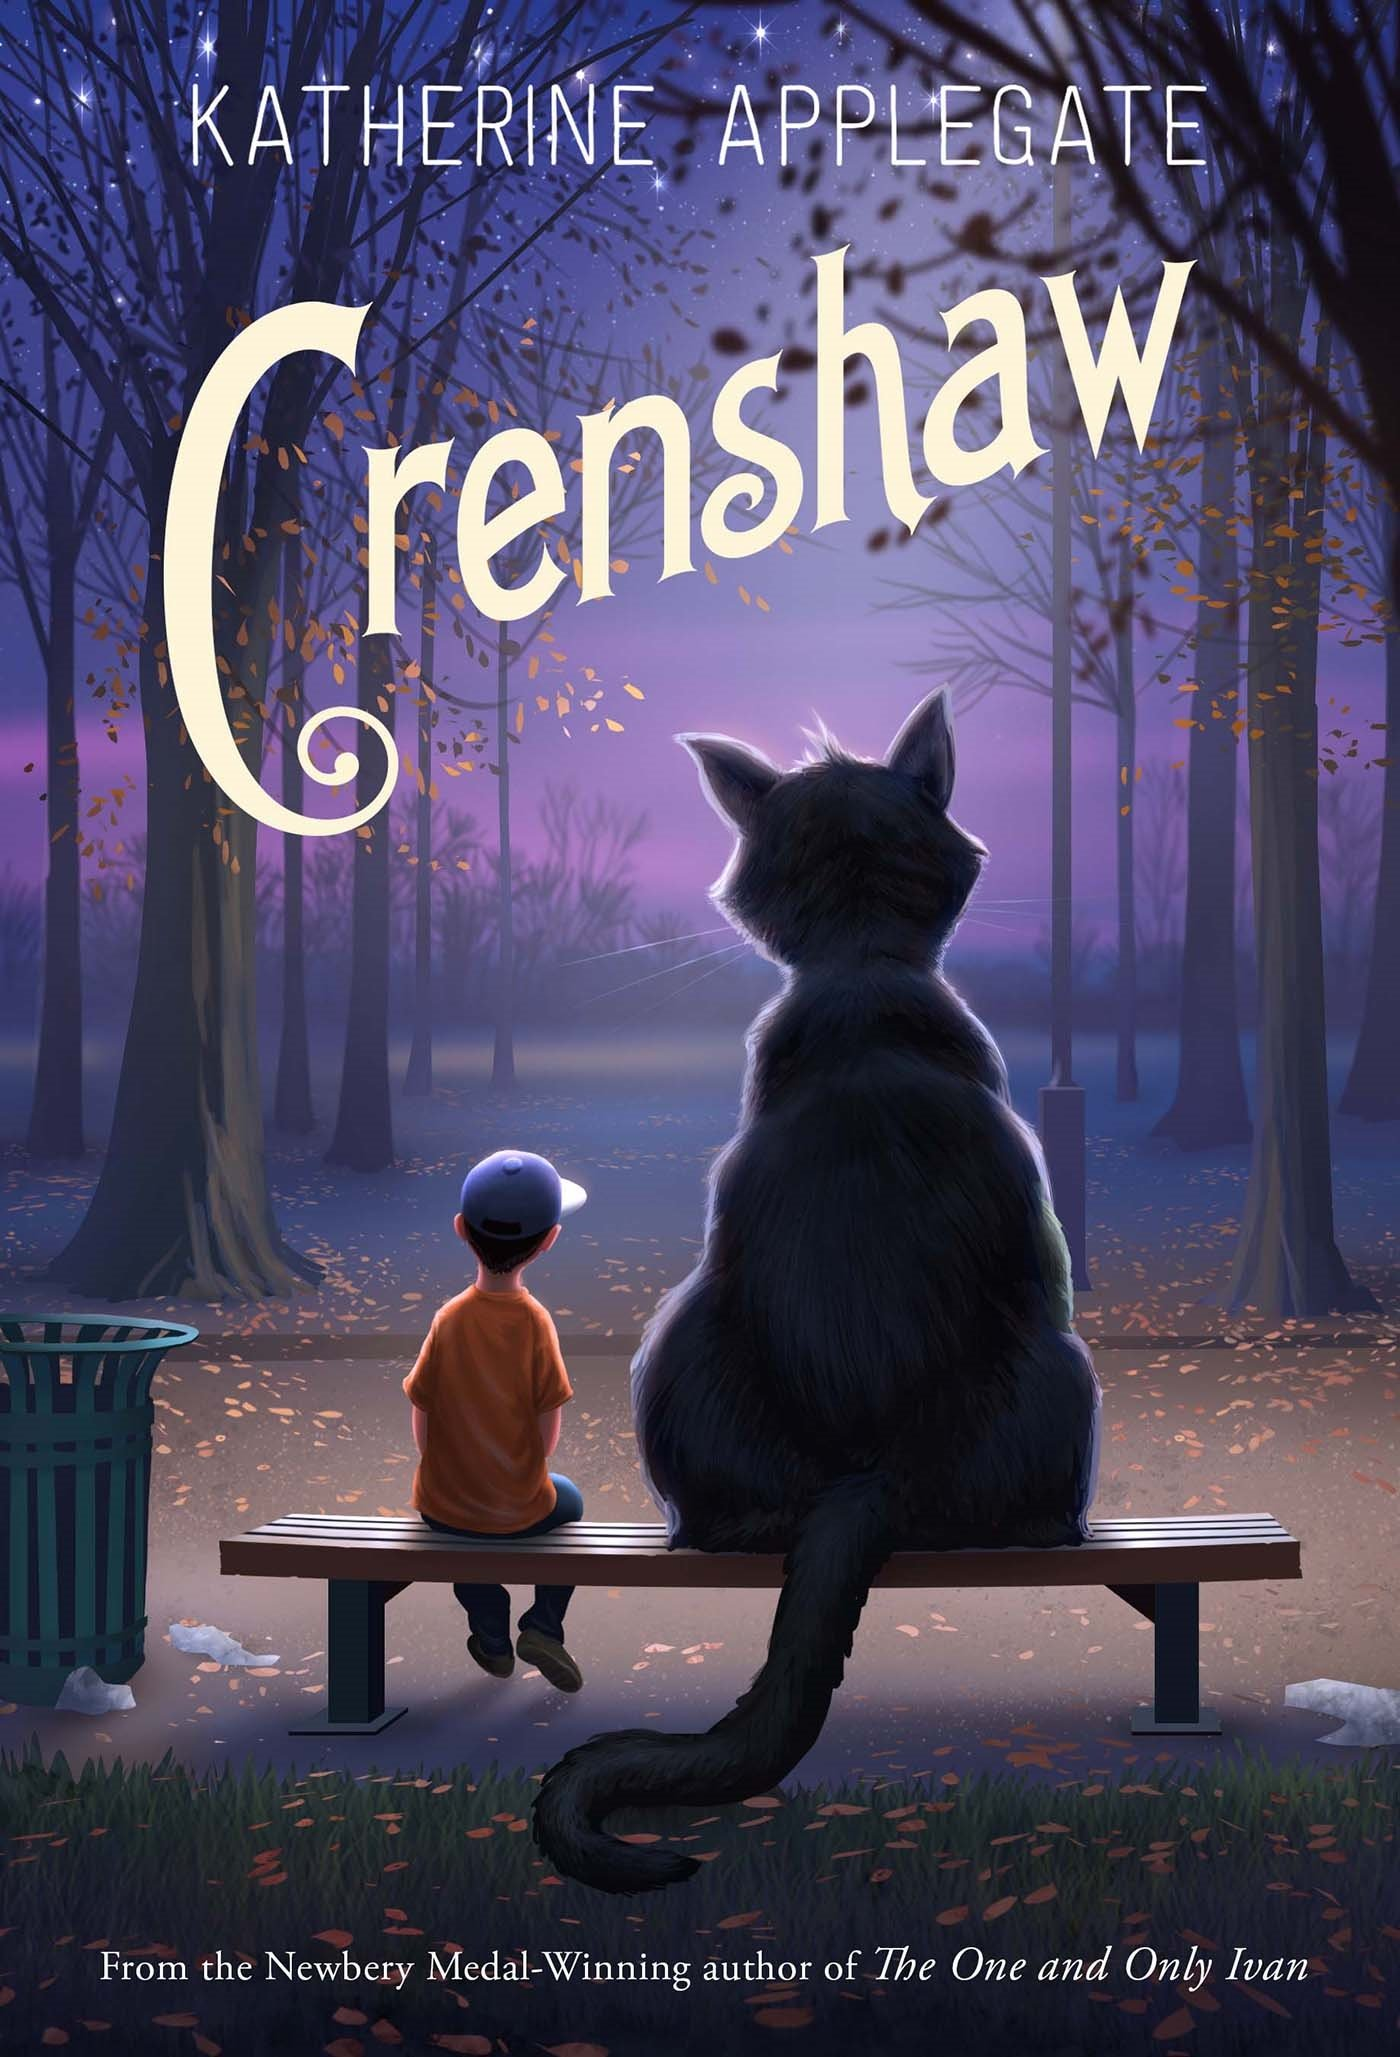 обложка книги «Crenshaw»